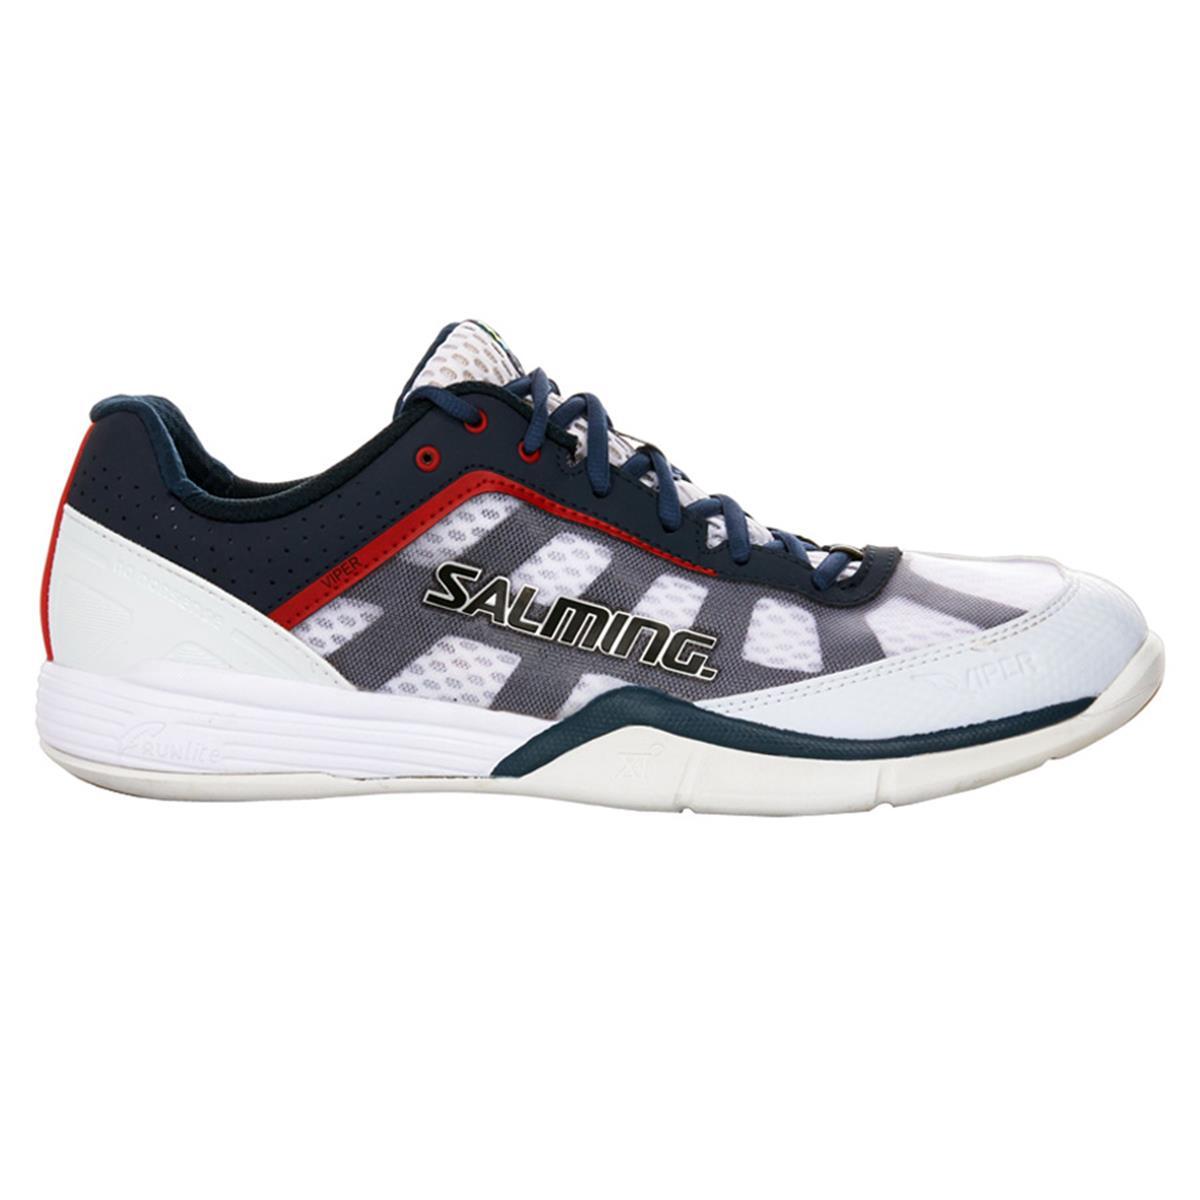 Salming Viper Mens Squash Shoes (White-Navy)   Direct